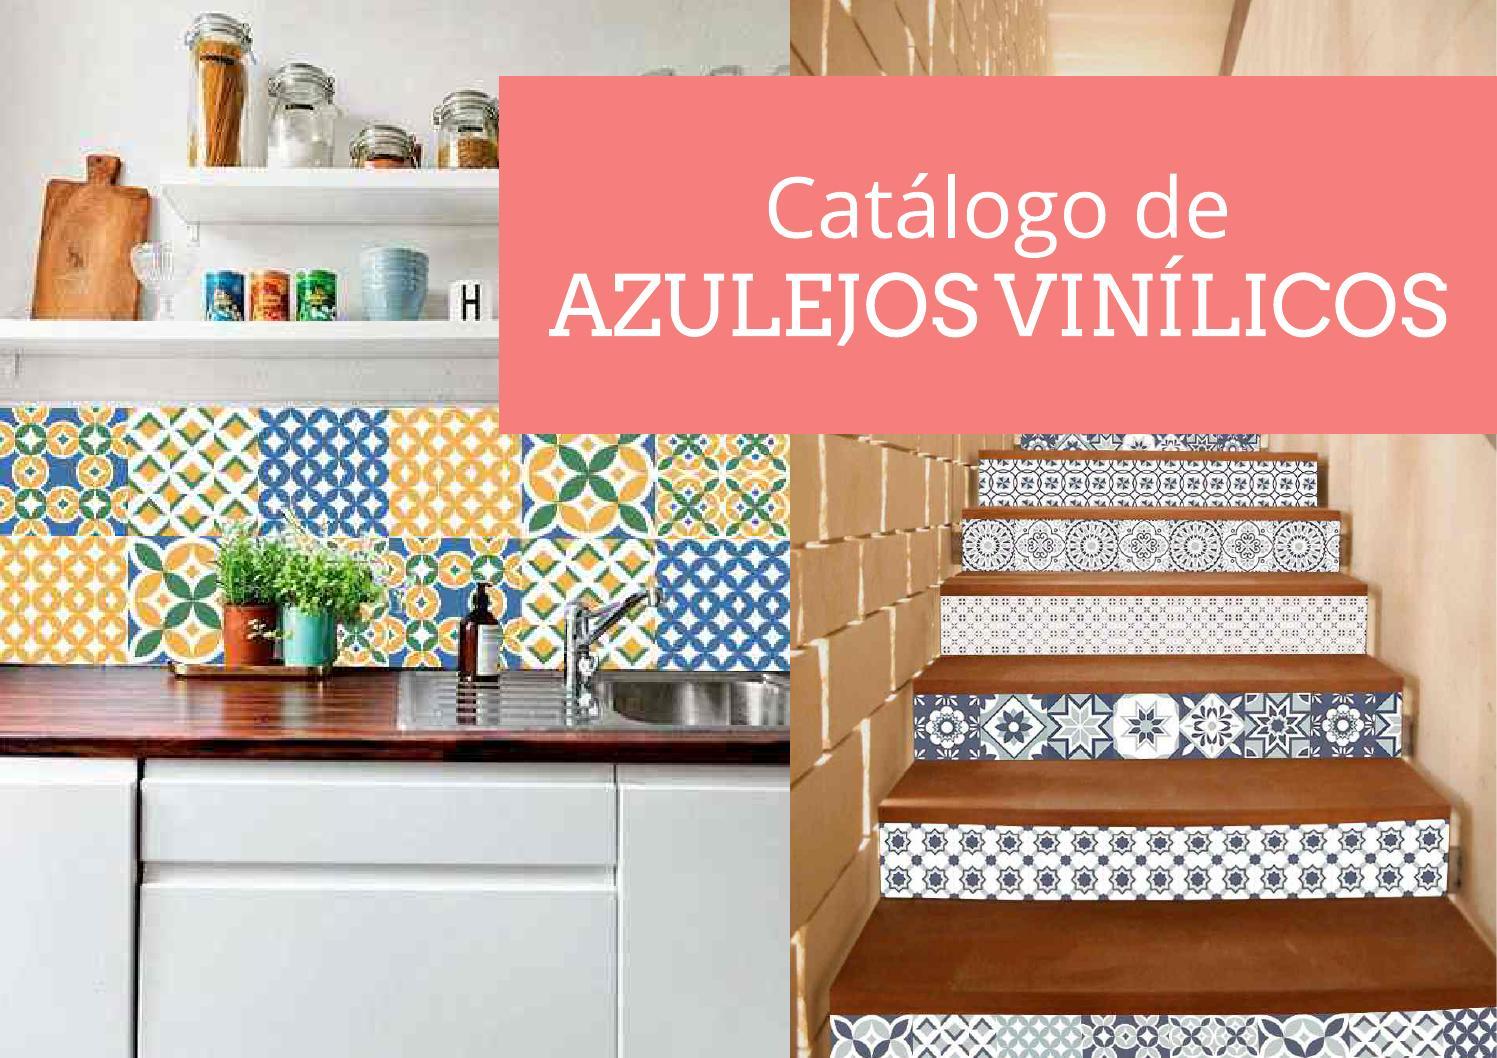 Cat logo de azulejos vin licos by ohmaigod issuu - Azulejos vinilicos ...